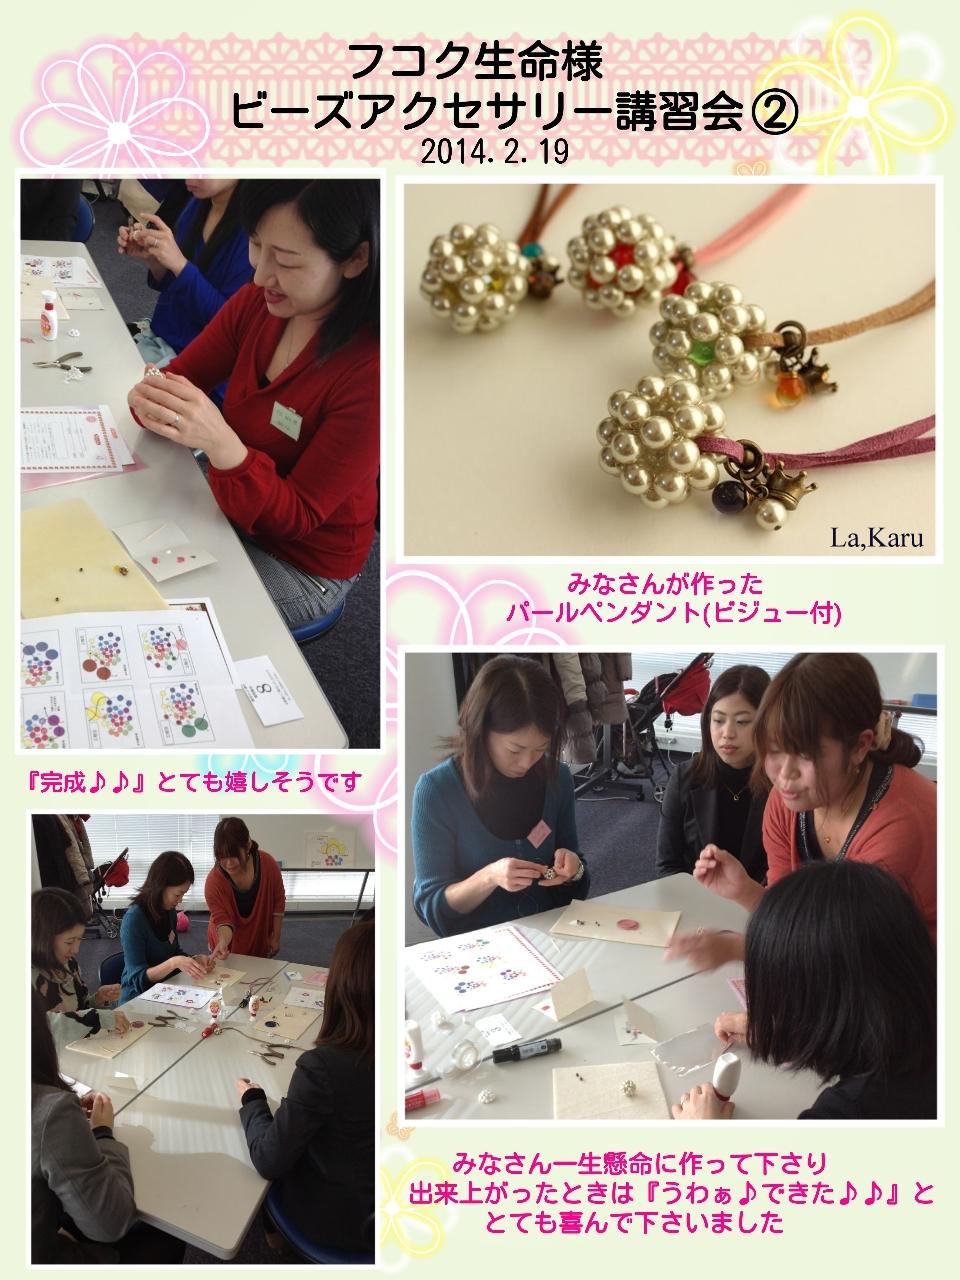 LINEcamera_share_2014-03-05-16-50-22-1.jpg